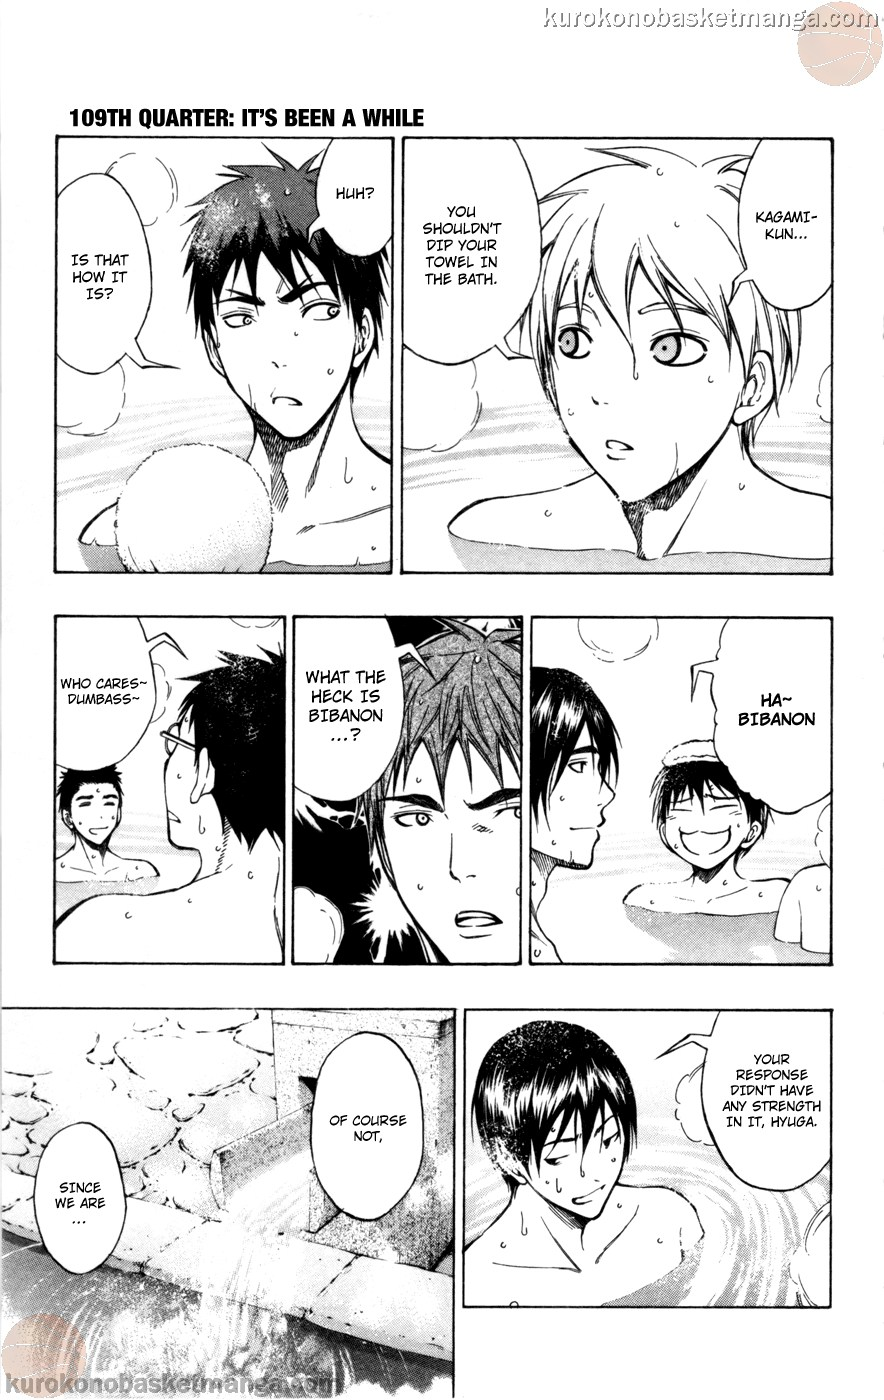 Kuroko no Basket Manga Chapter 109 - Image 05